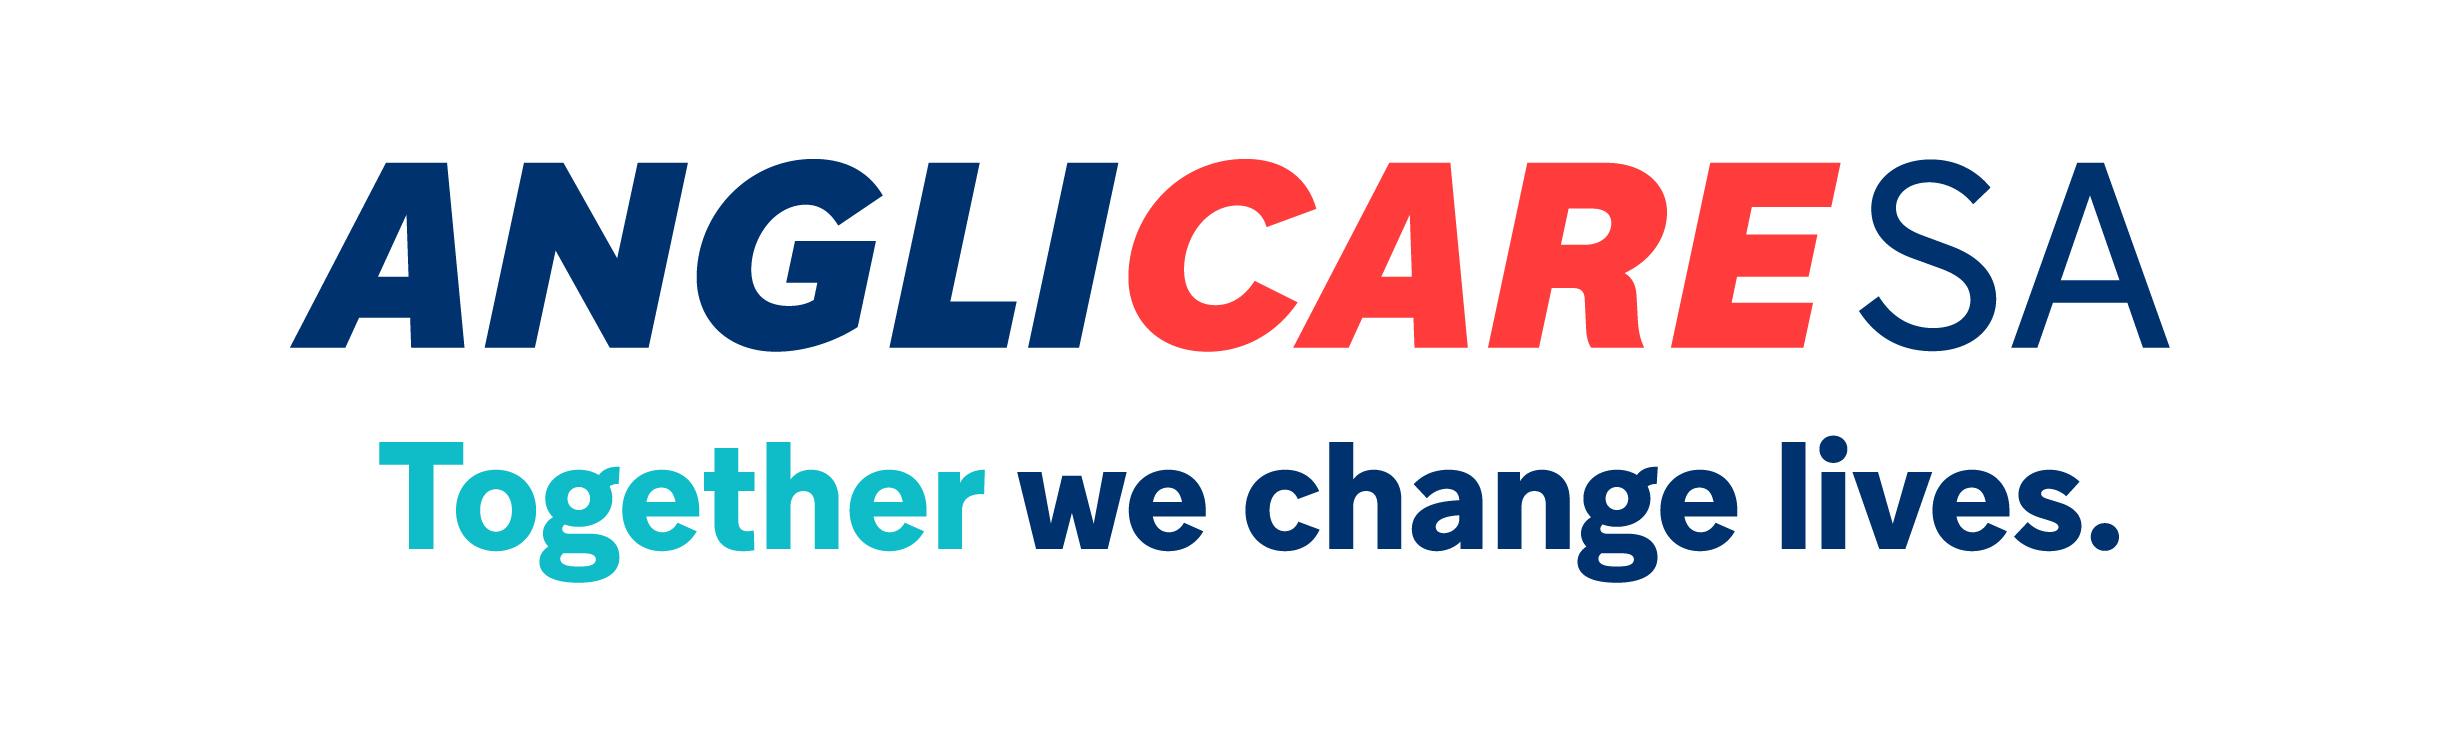 AnglicareSA Logo